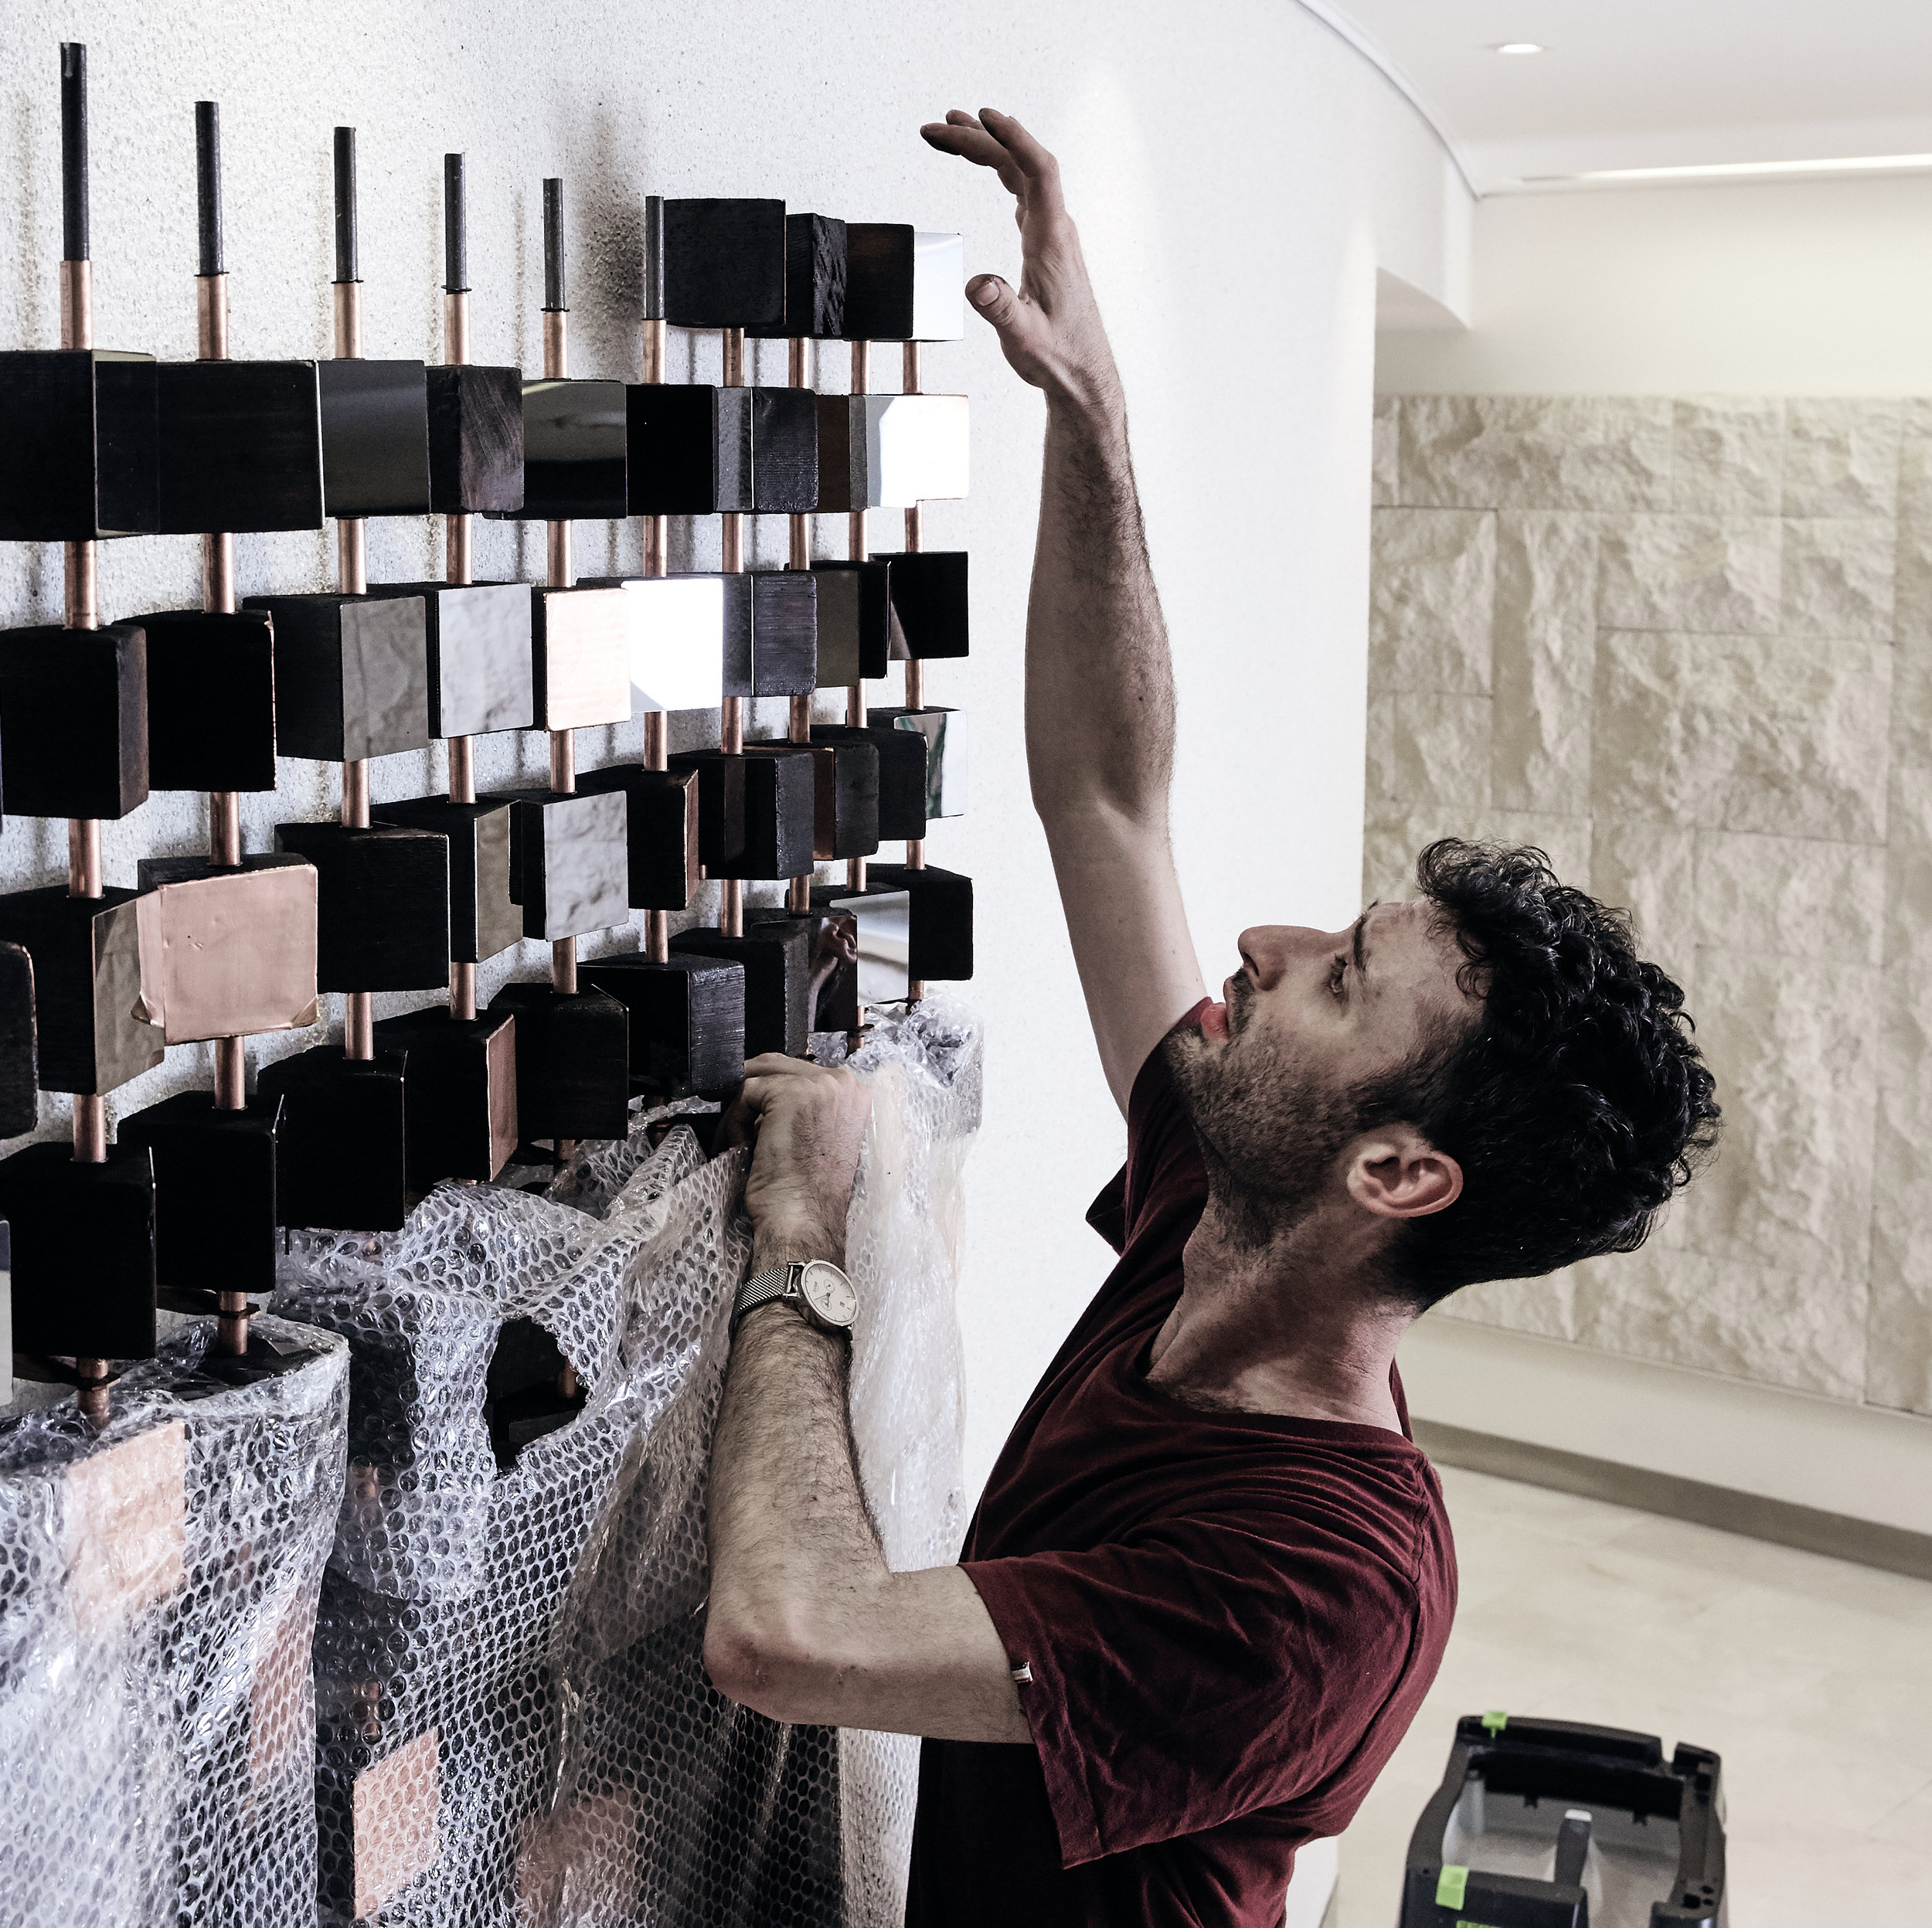 Jonathan, making the final adjustments to the installation at Deloitte. Credit: So Watt/Nic Gossage